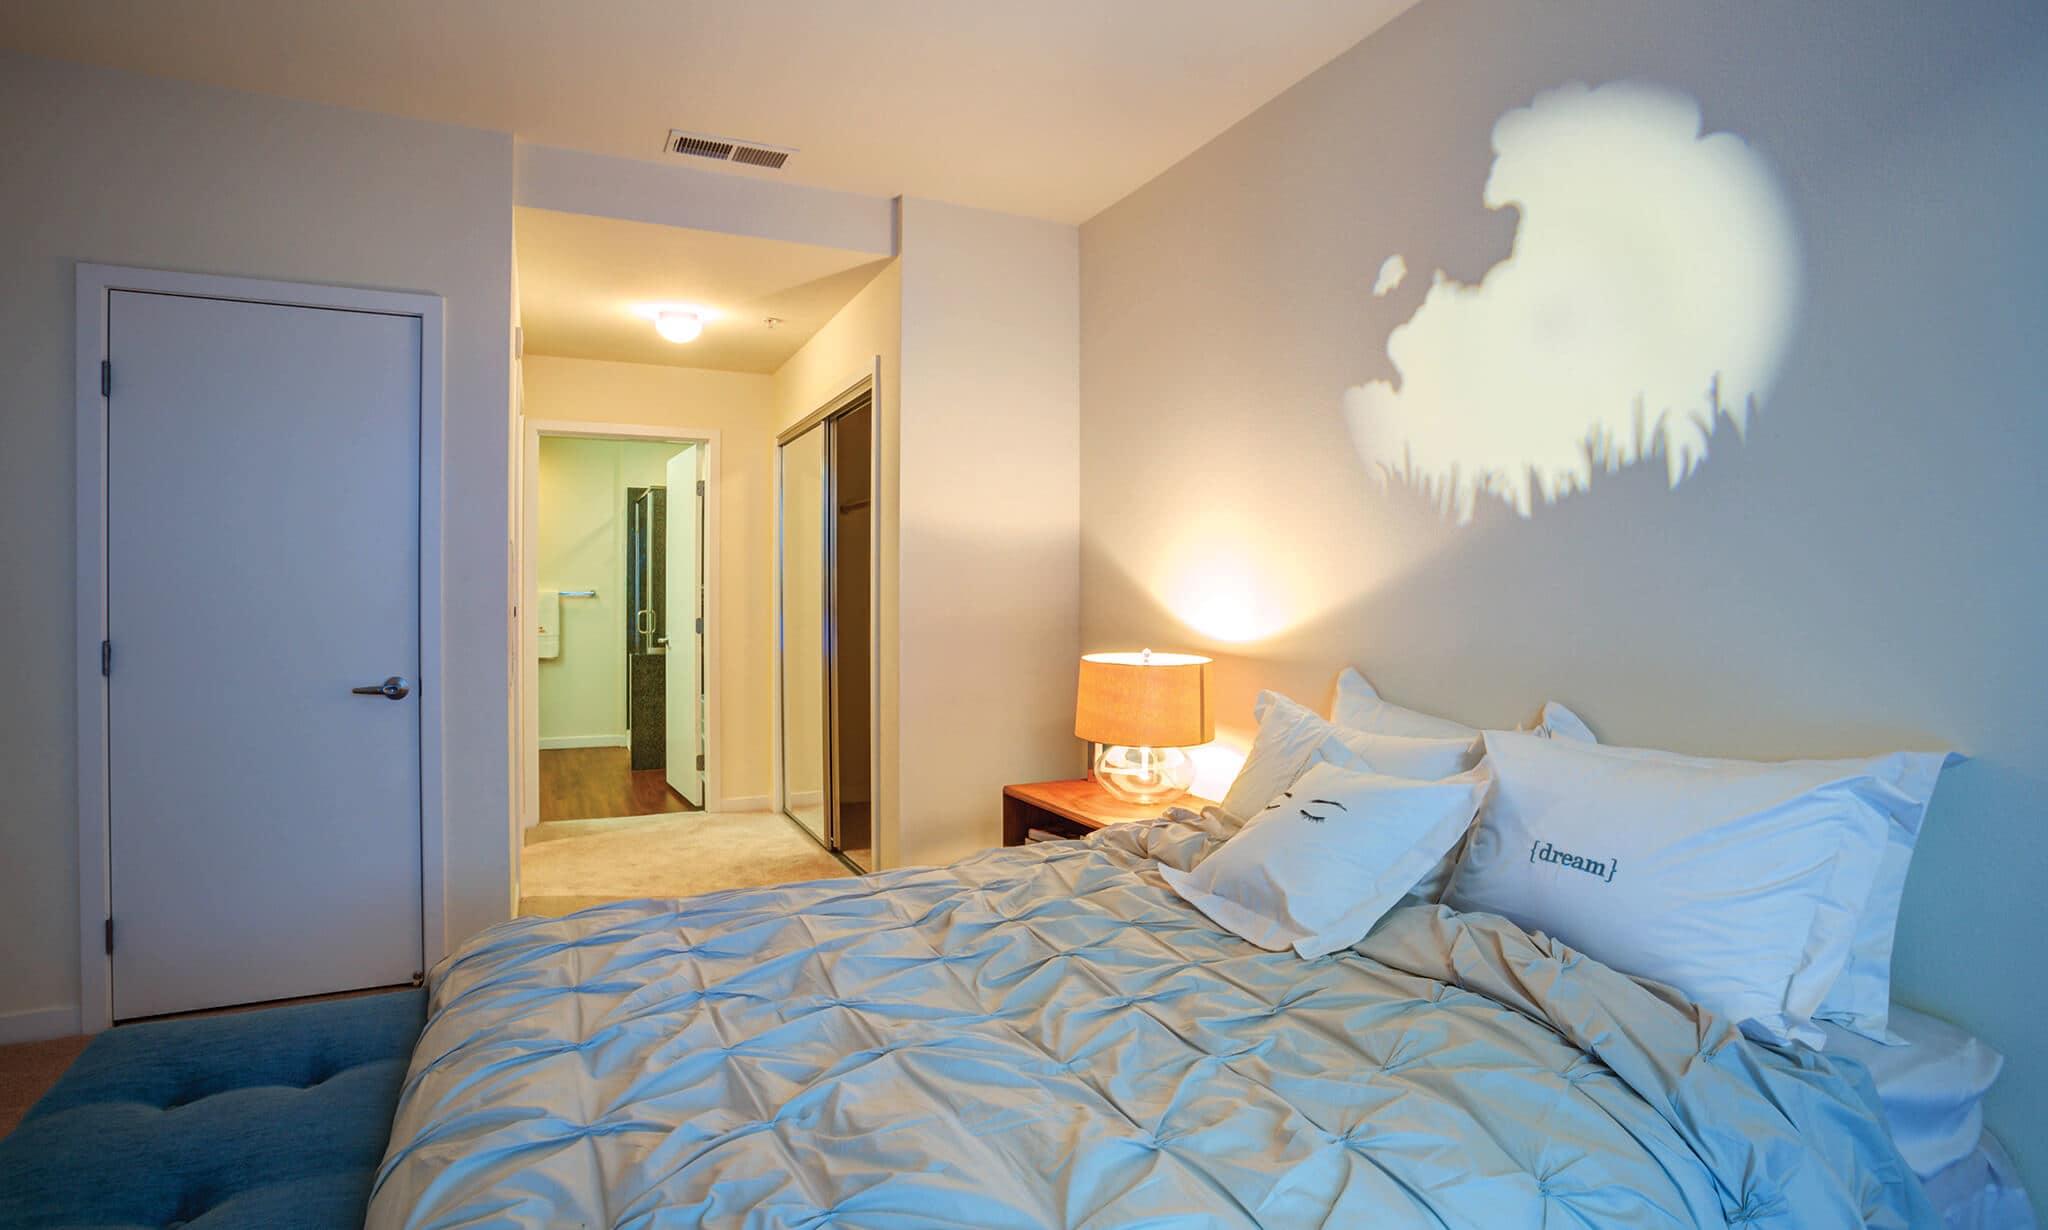 550 Moreland Apartments apartments in Santa Clara CA to rent photo 11